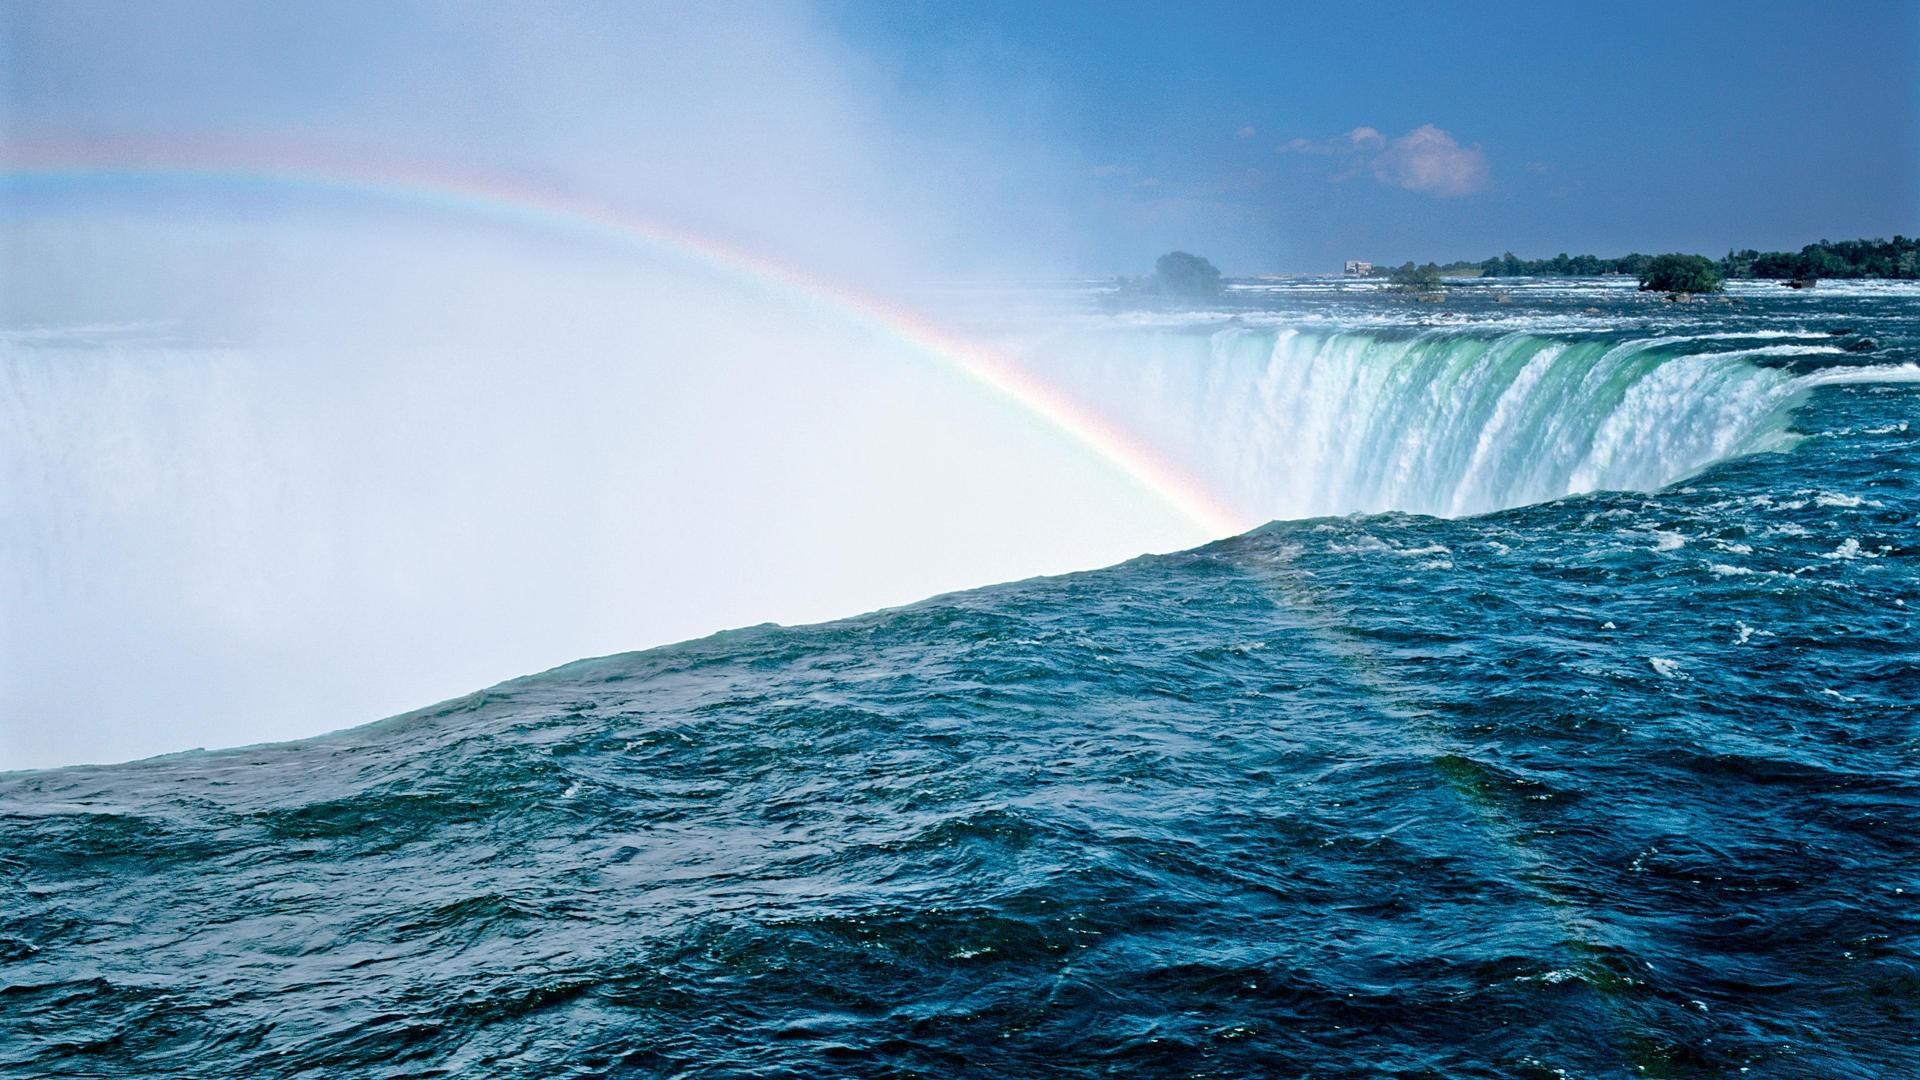 Niagara Falls HD Wallpaper - WallpaperSafari